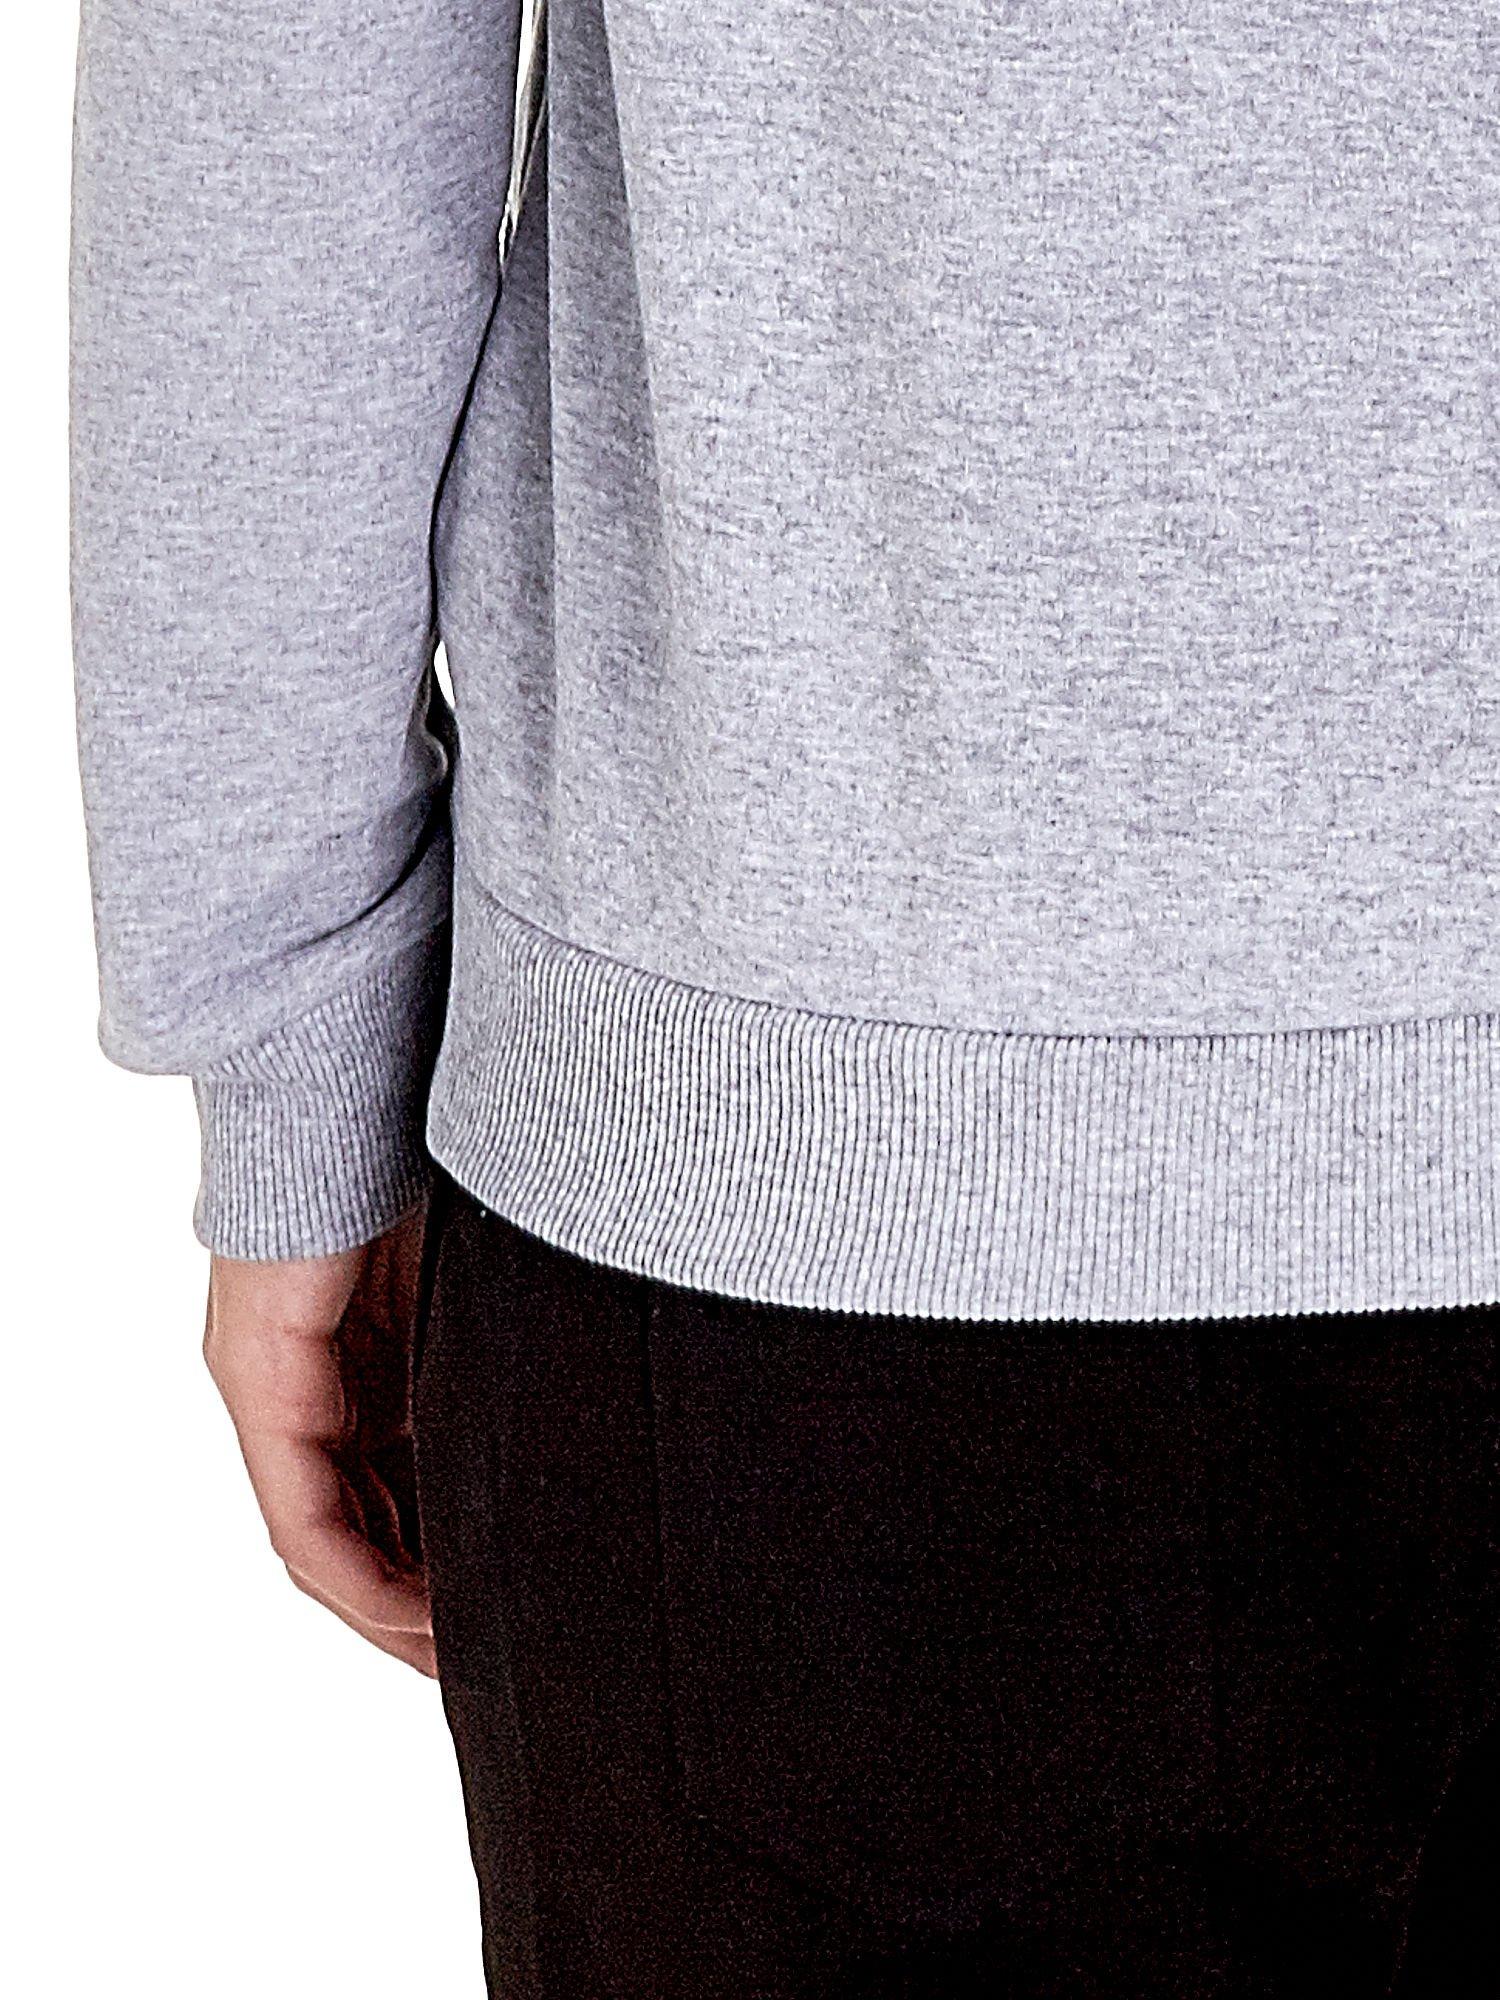 Szara zasuwana bluza z kapturem z napisem STYLISH & LOVABLE                                  zdj.                                  6